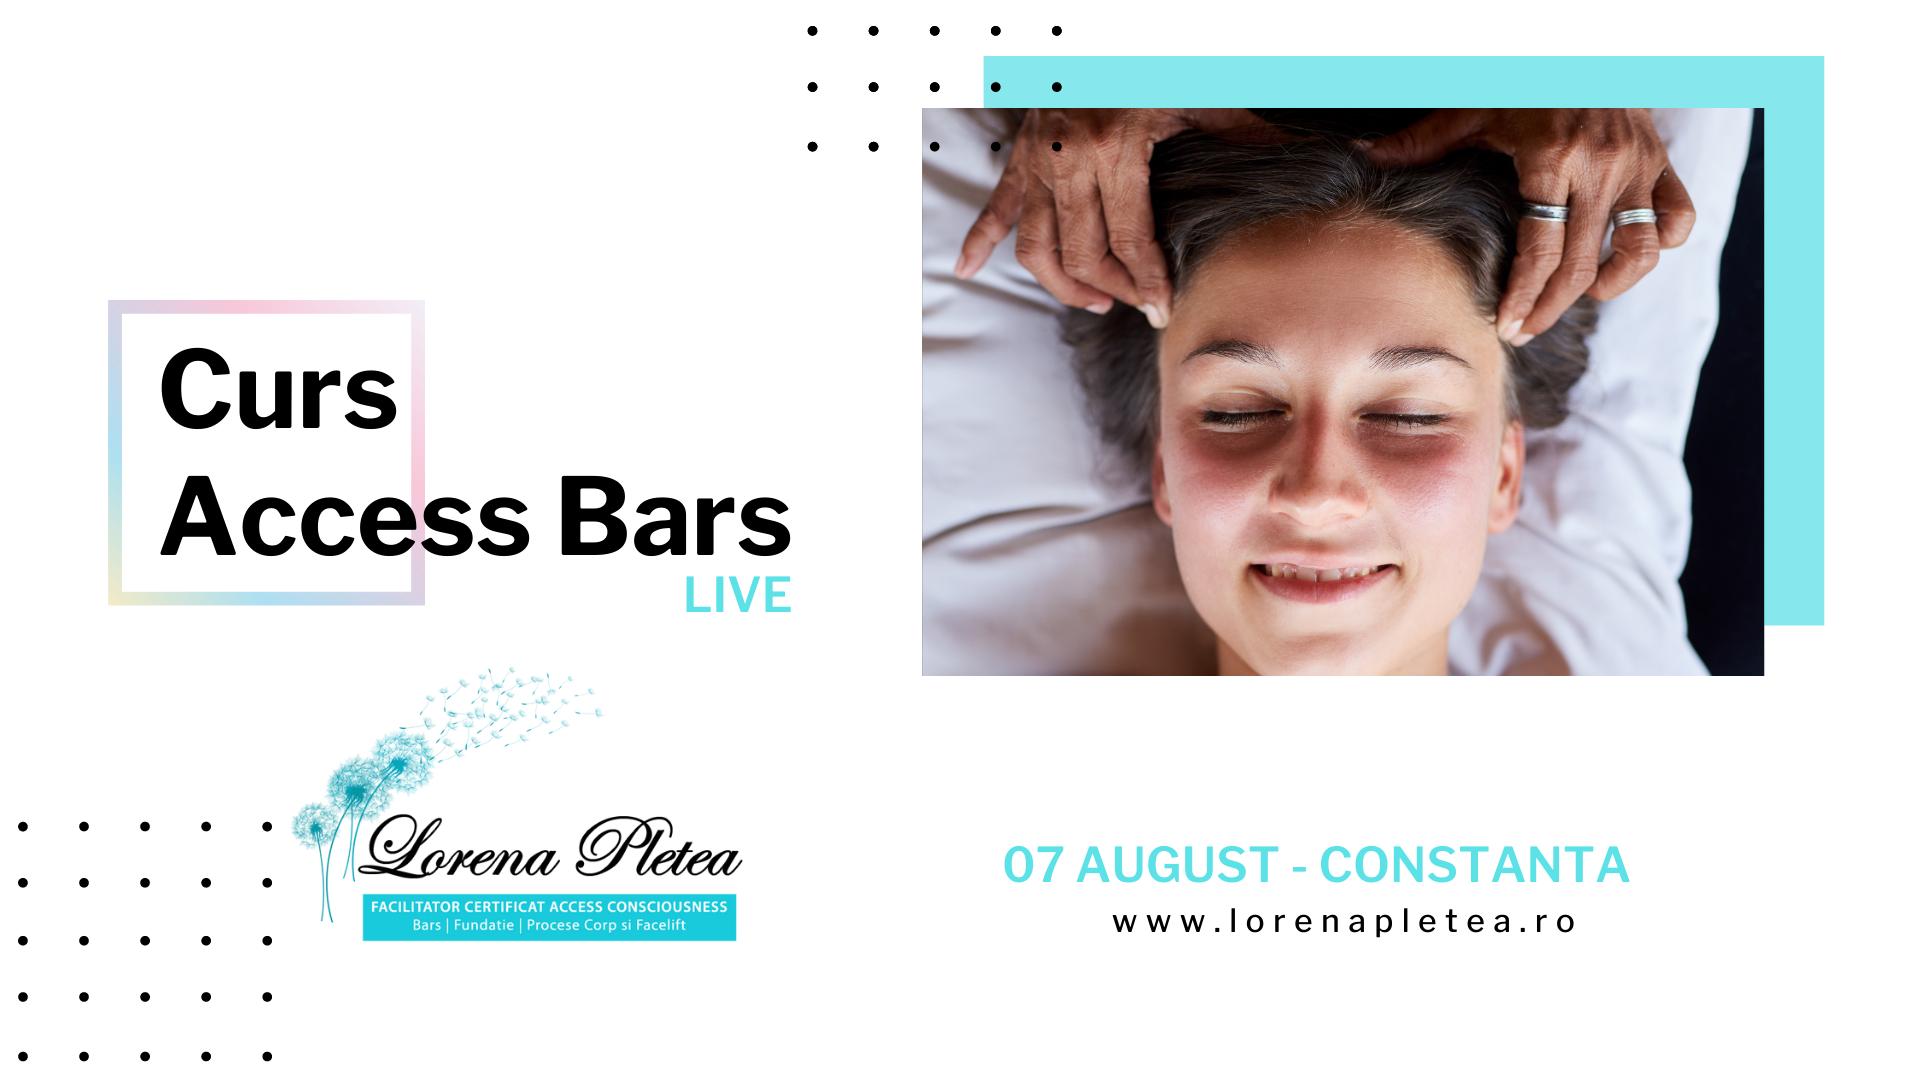 Curs Access Bars – 07 August Constanta